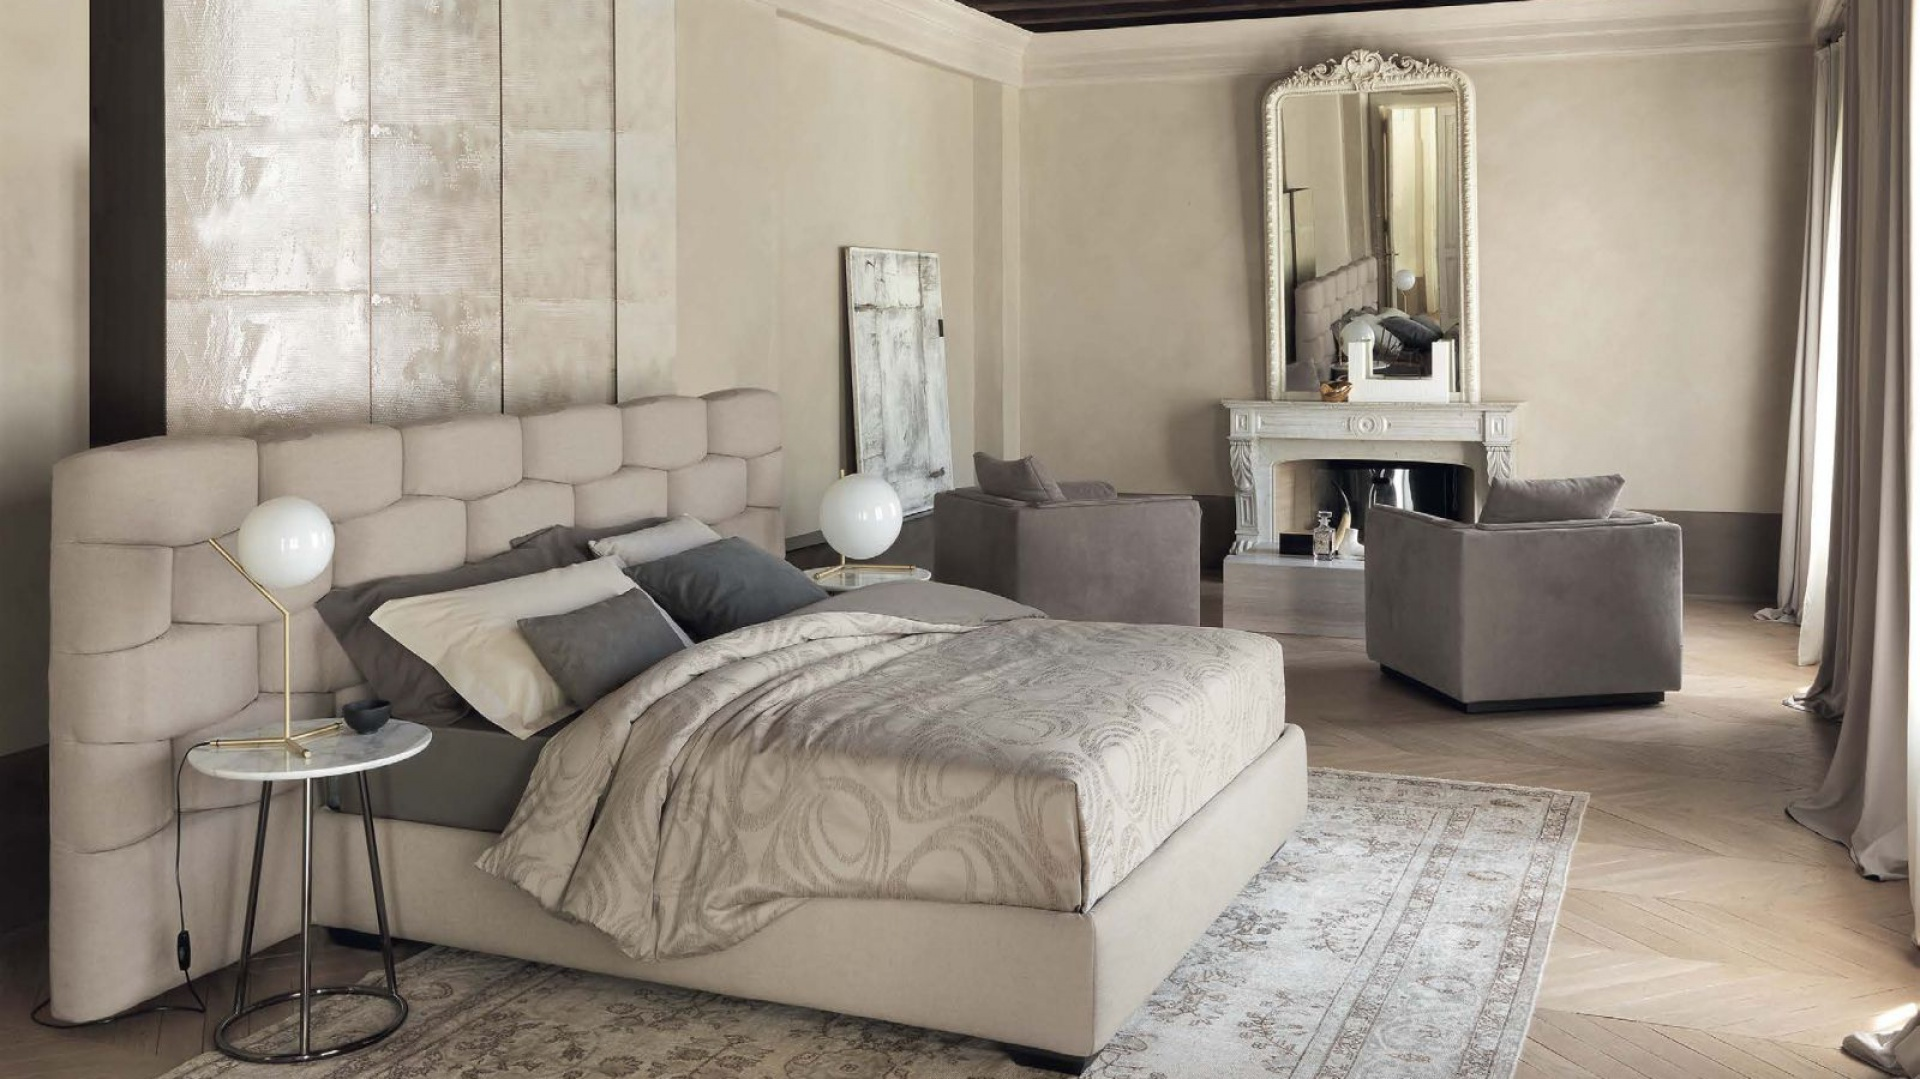 Efektowne łóżko Majal marki Flou. Fot.  Flou / Galeria Heban